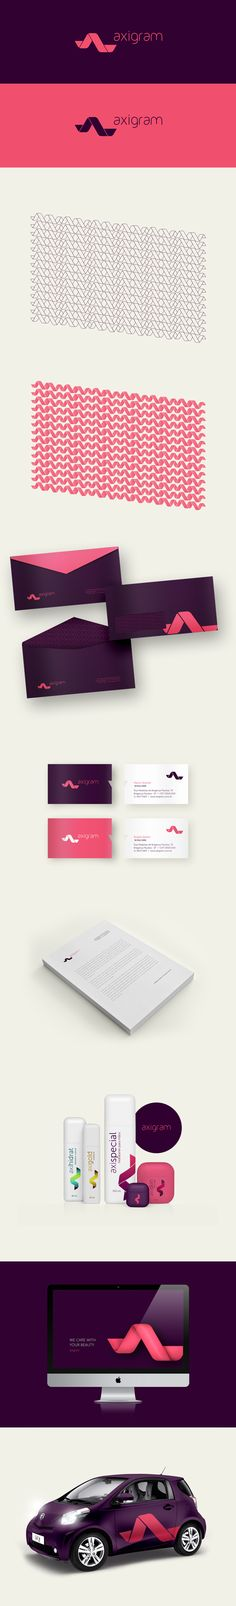 Axigram Branding by Douglas Marchiori, via Behance #identity #packaging #branding #marketing PD